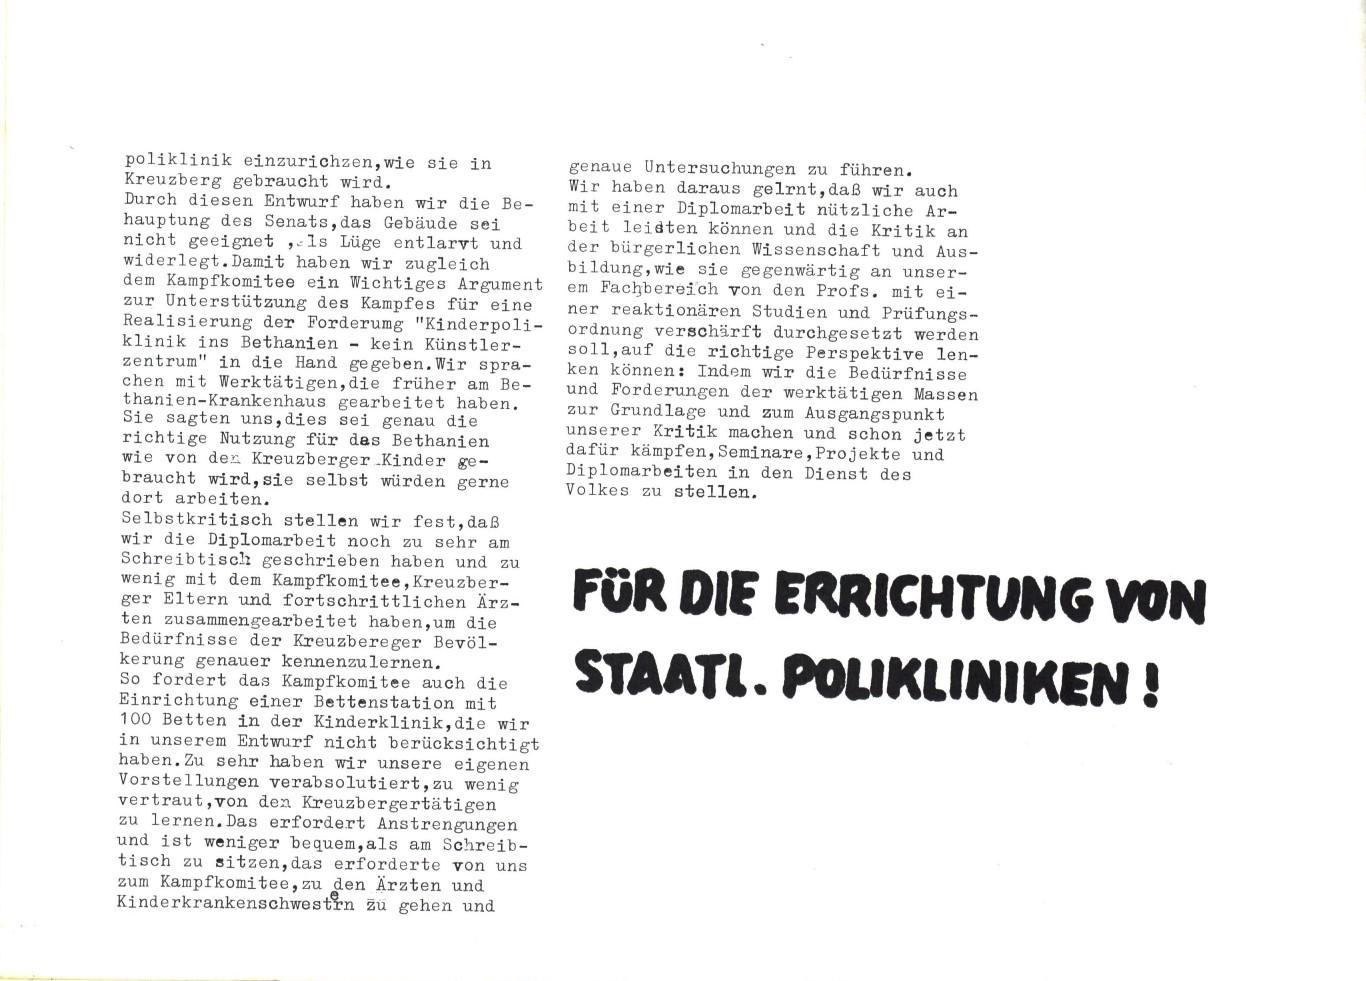 Berlin_KSV_1974_Rote_Bauwochen_61